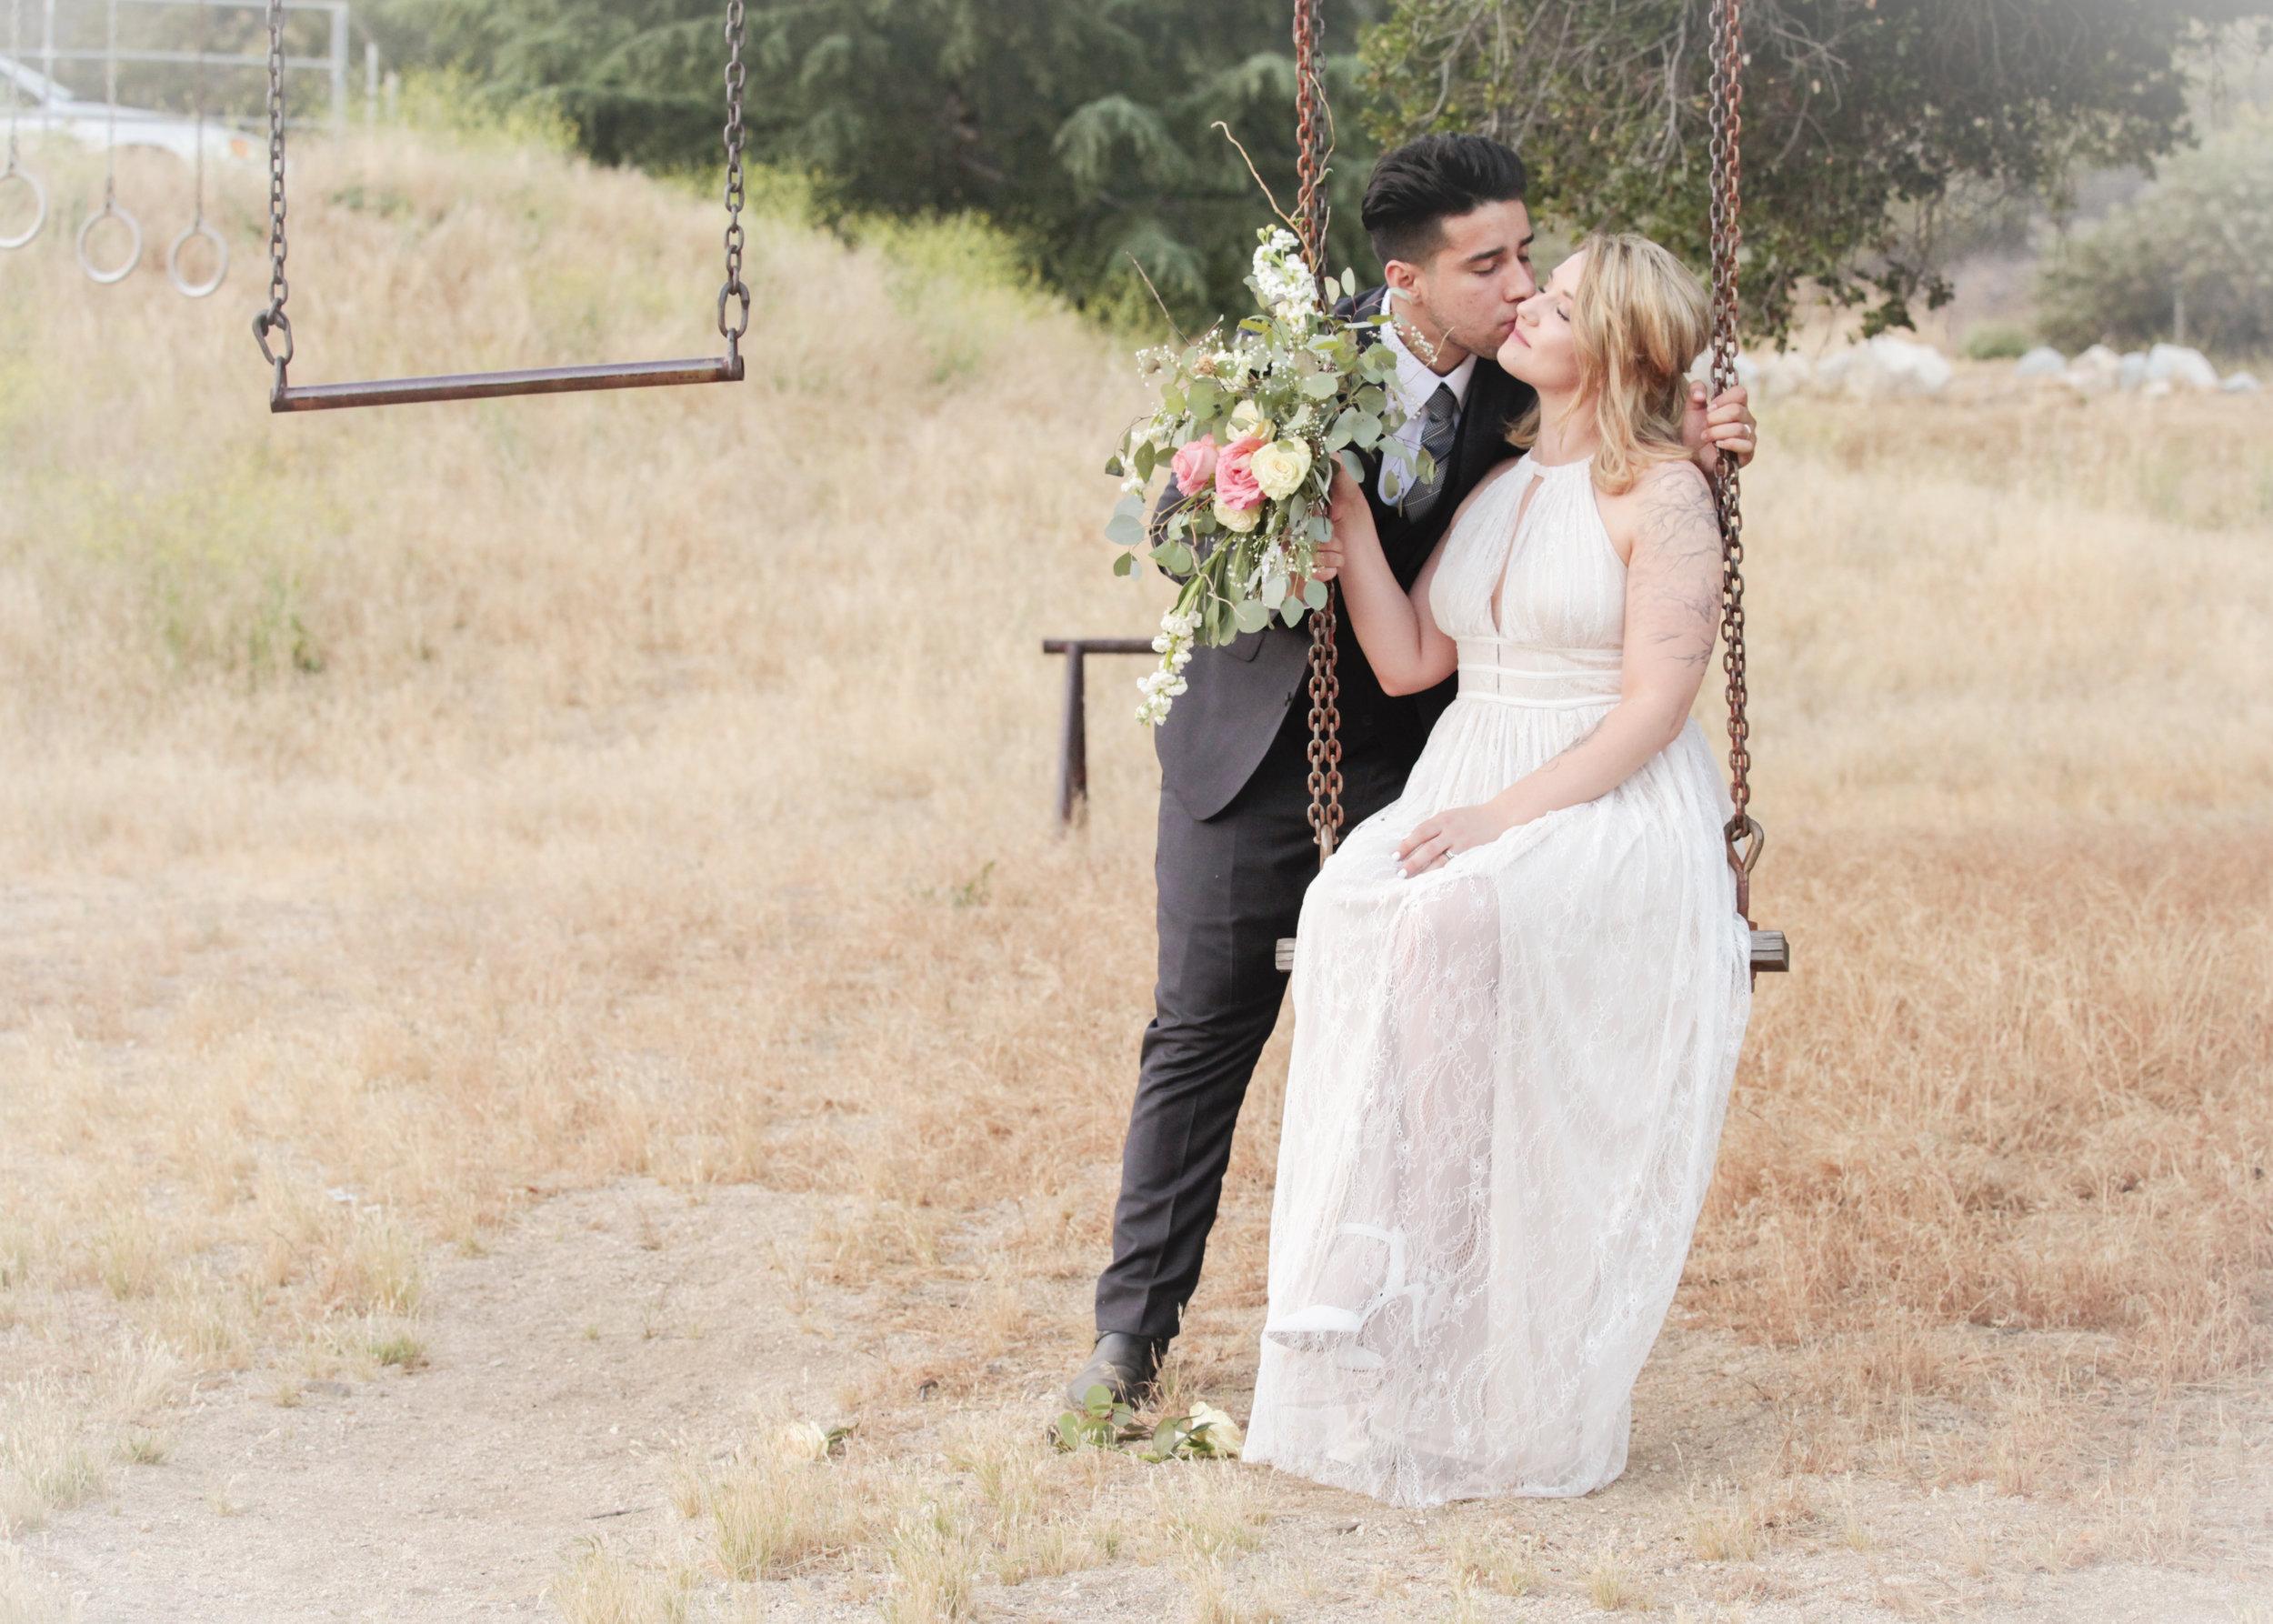 stephanieXmatt_wedding_346.jpg